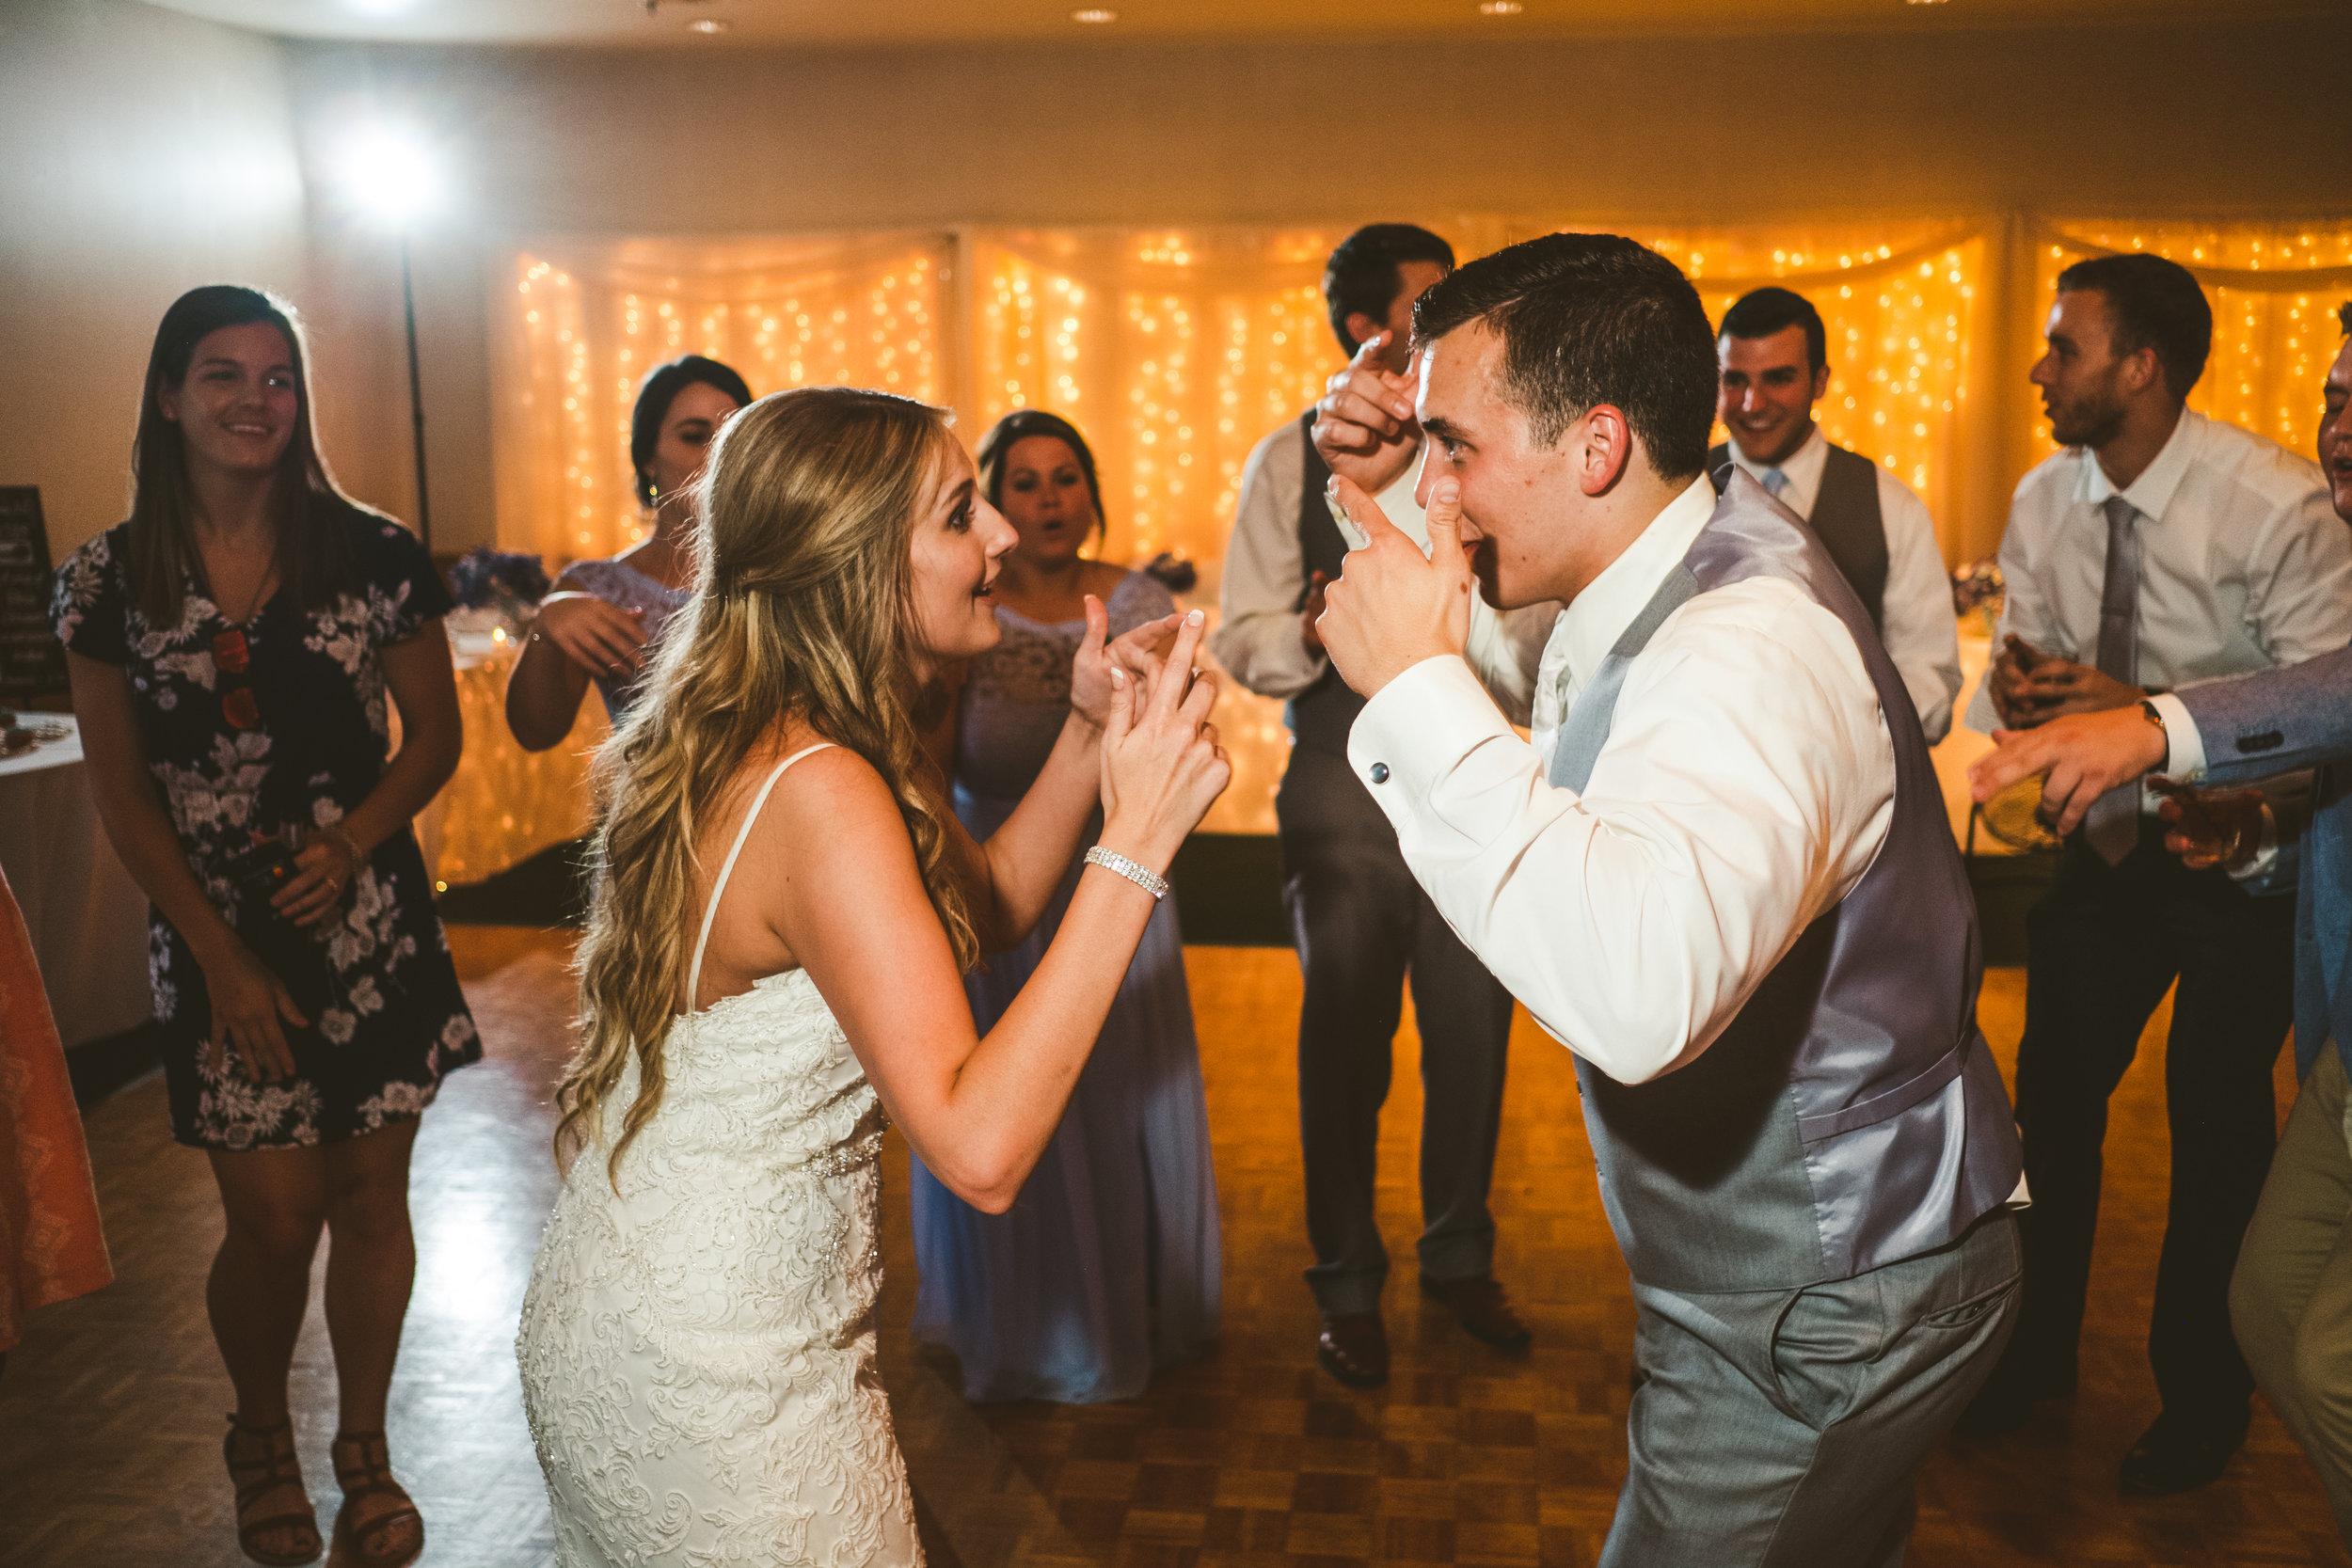 Wedding Photographers from Northwest Ohio at Wedding Reception in Bowling Green Stone Ridge Golf Club